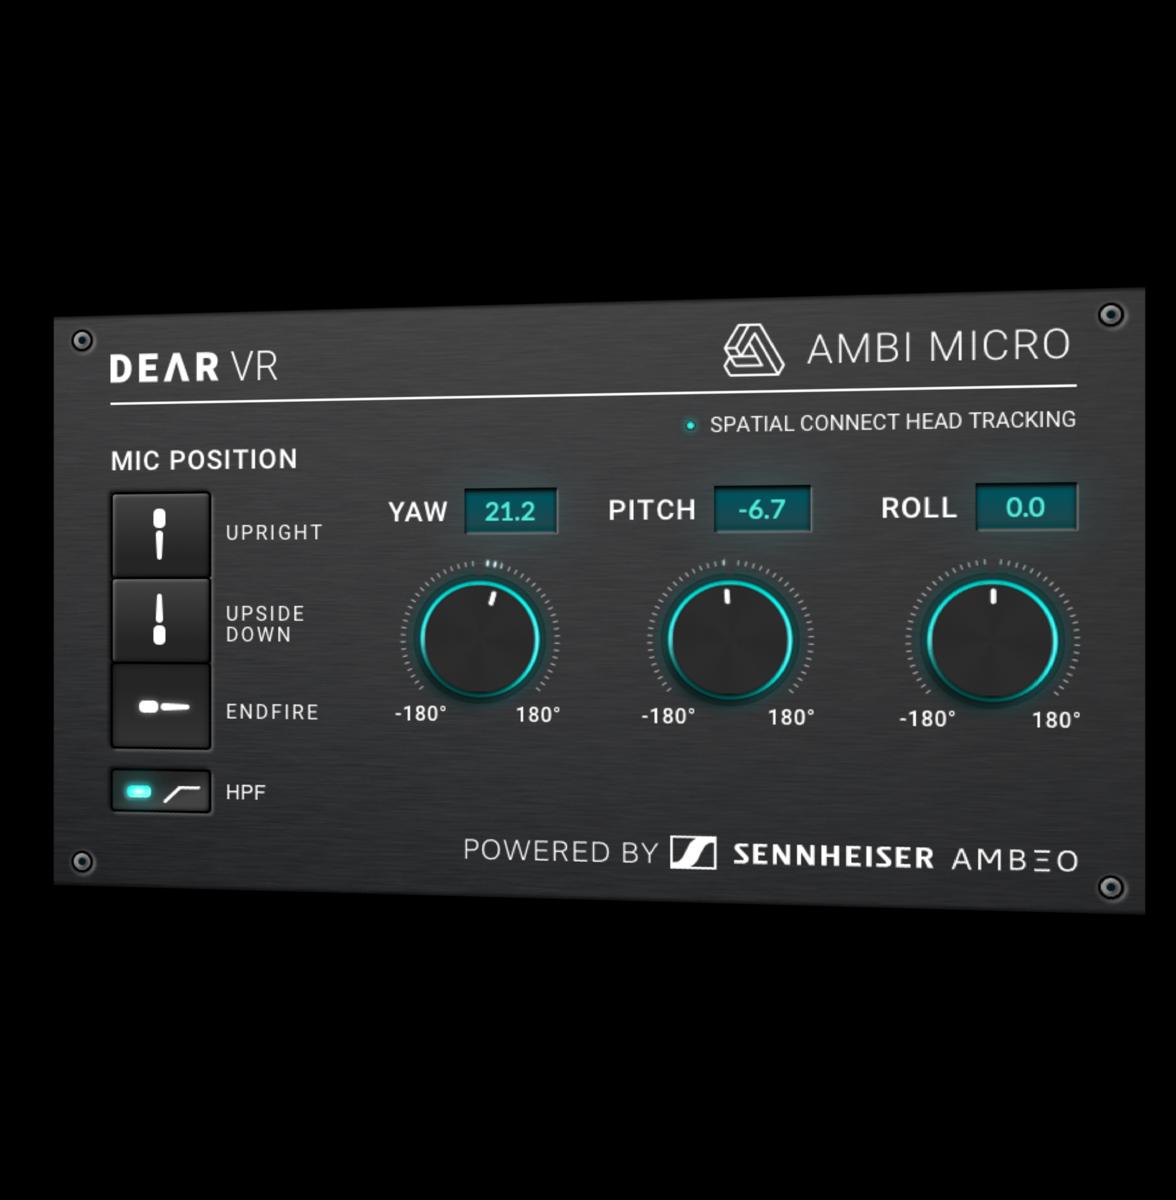 dearVR AMBI MICRO - Features